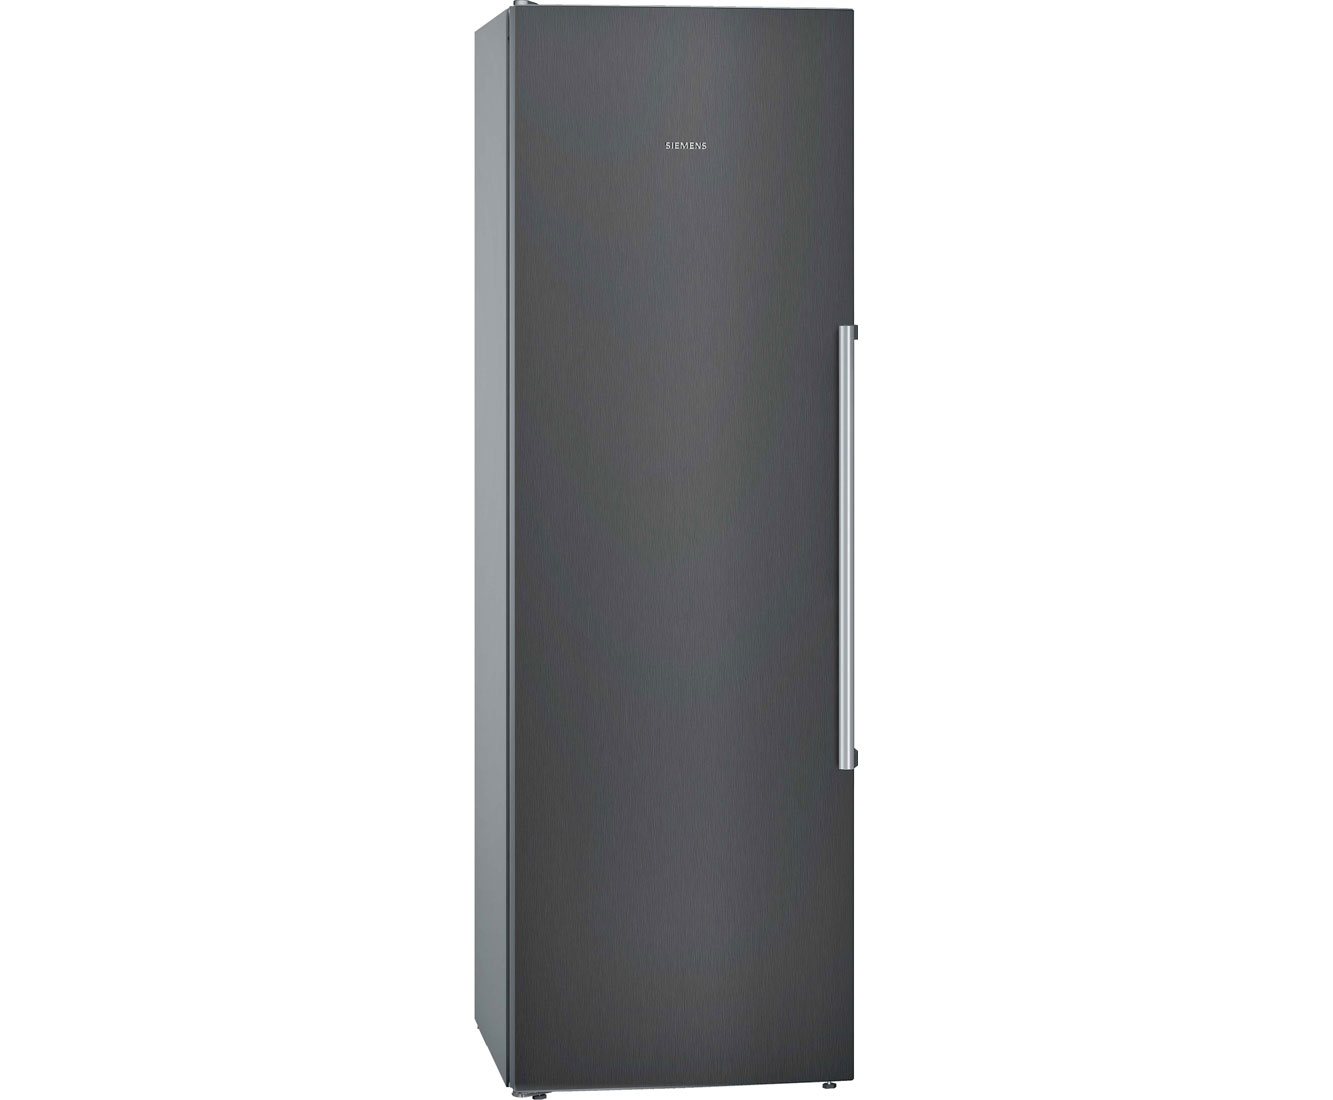 Bomann Kühlschrank Nass : Rabatt preisvergleich.de weiße ware u003e kühlen gefrieren u003e kühlschrank